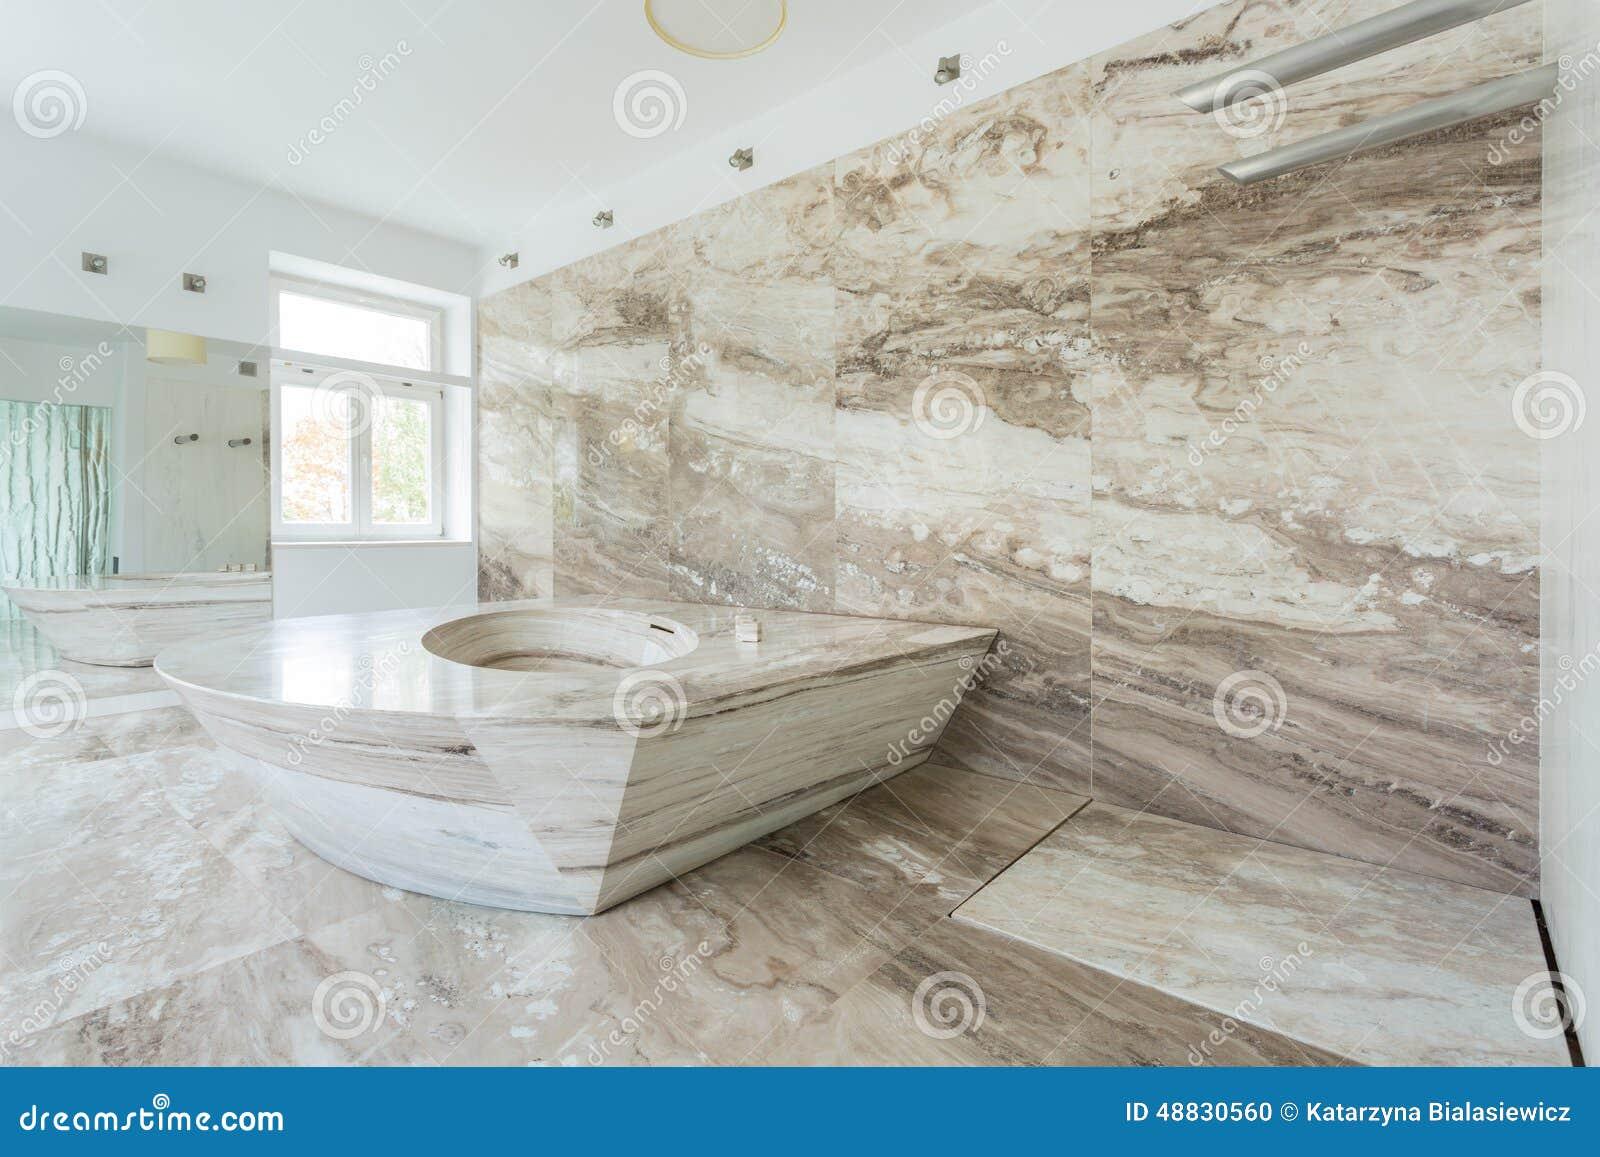 Luxury Bathroom With Marble Tiles Stock Photo Image